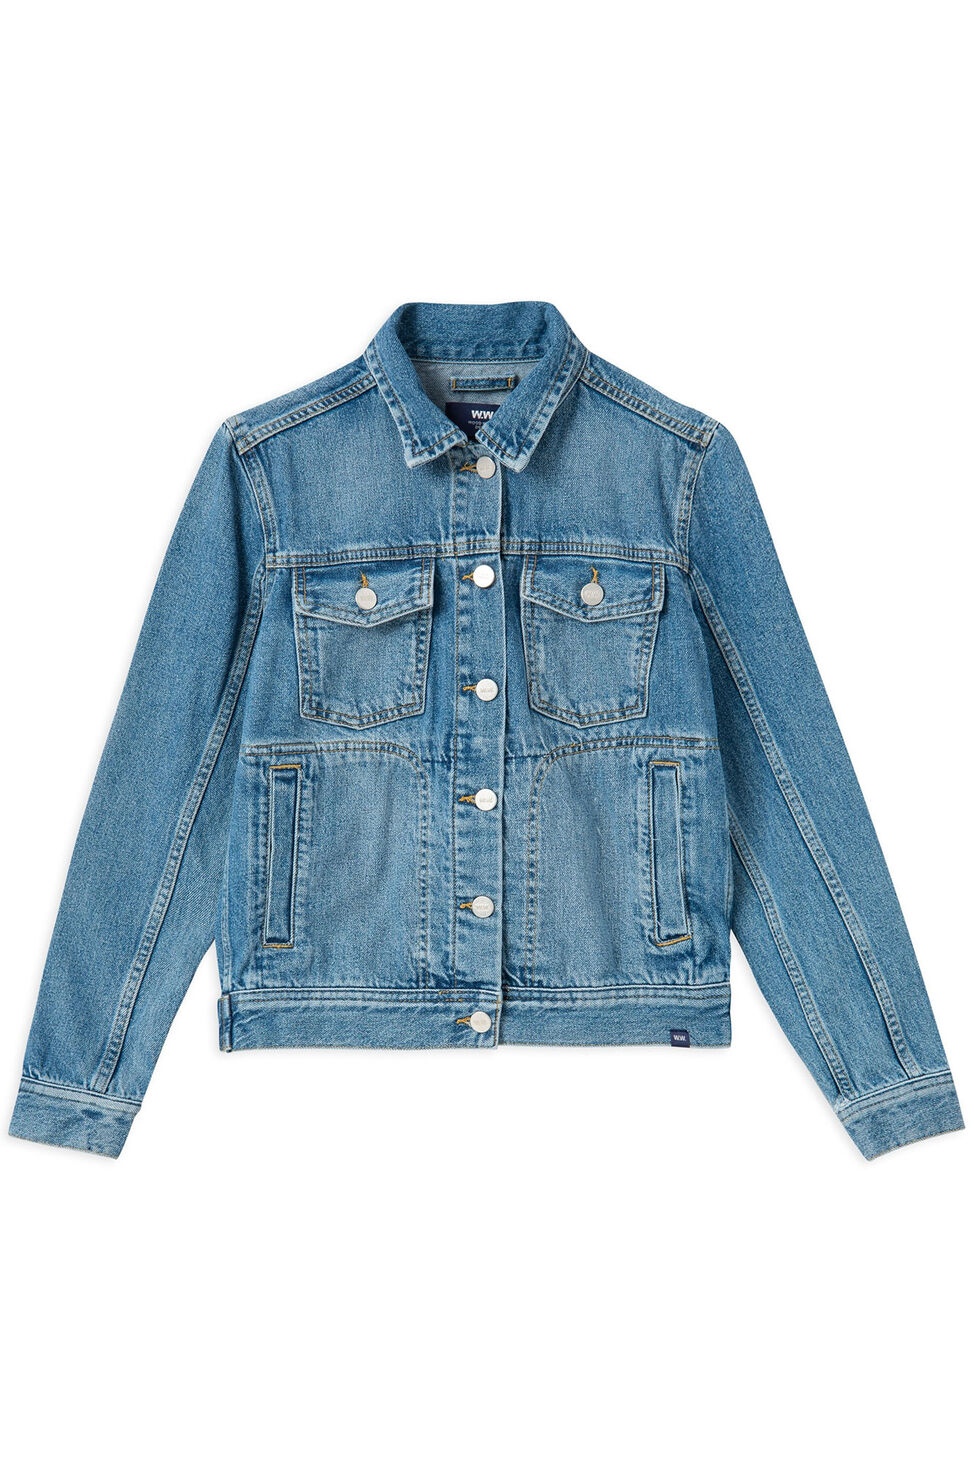 June jacket 11911200-7006, CLASSIC BLUE VINTAGE